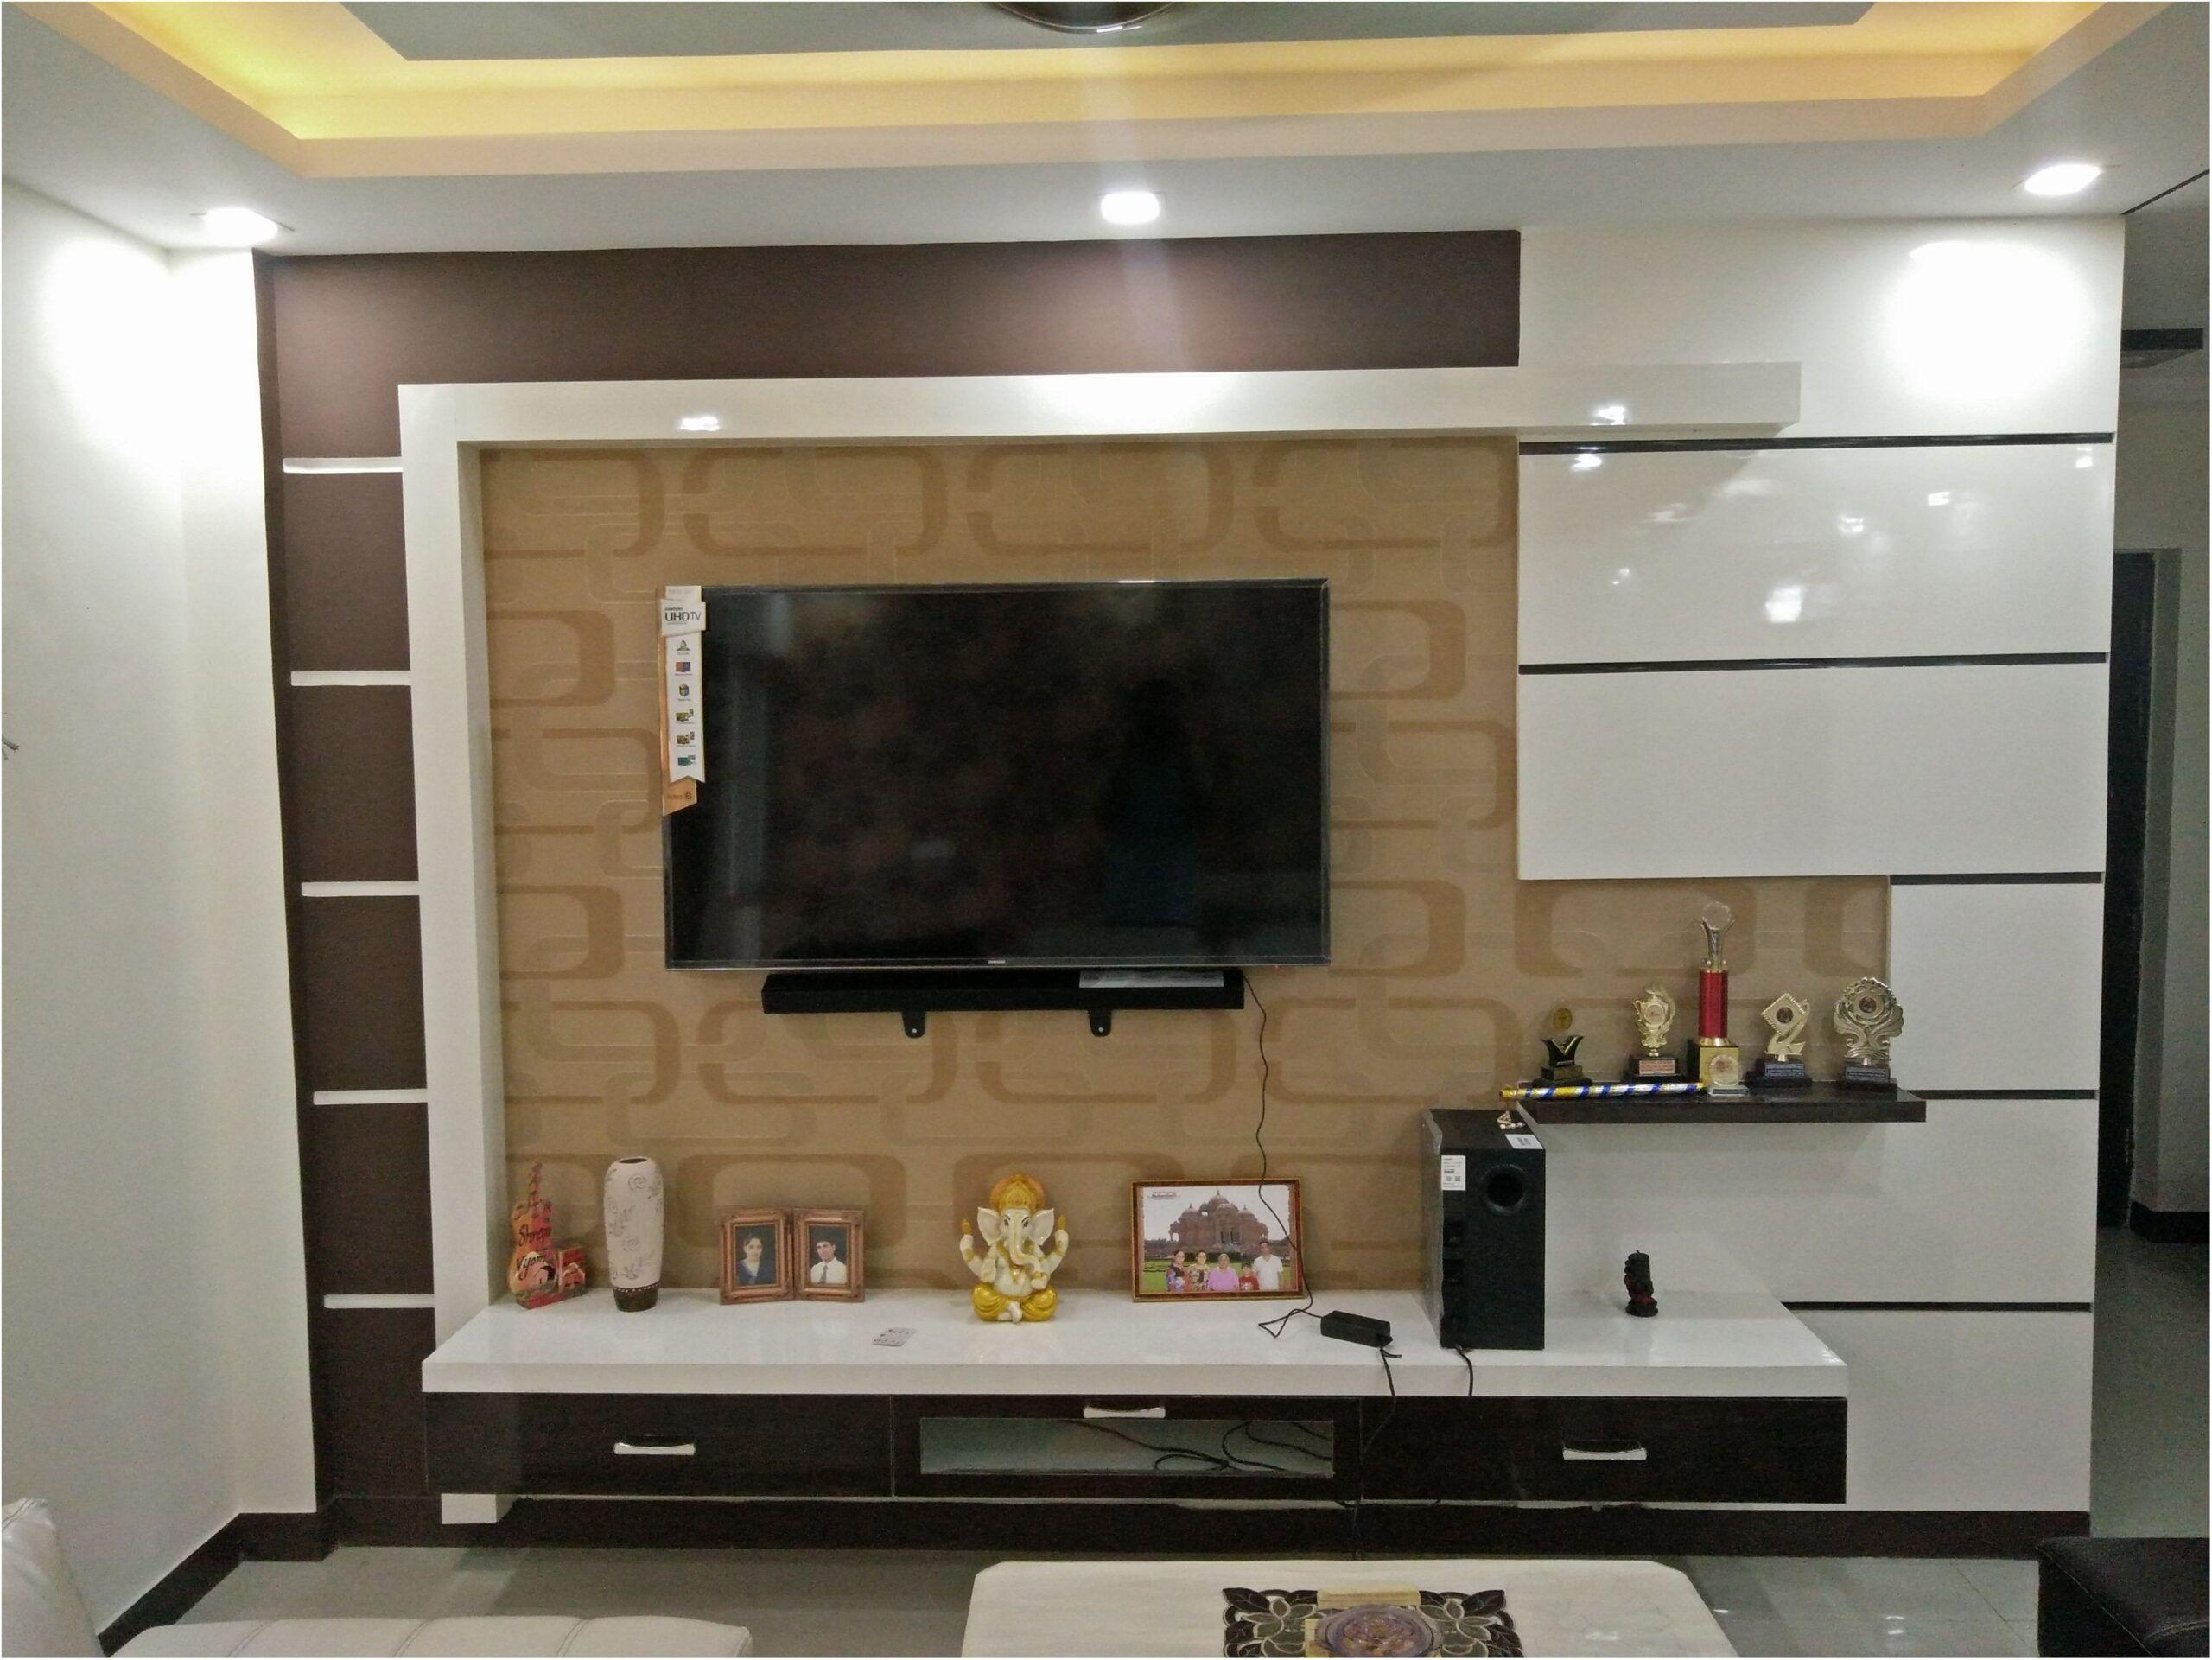 Living Room Television Interior Design Living Room Tv Cabinet Designs Living Room Tv Wall Living Room Tv Unit Designs #tv #in #living #room #design